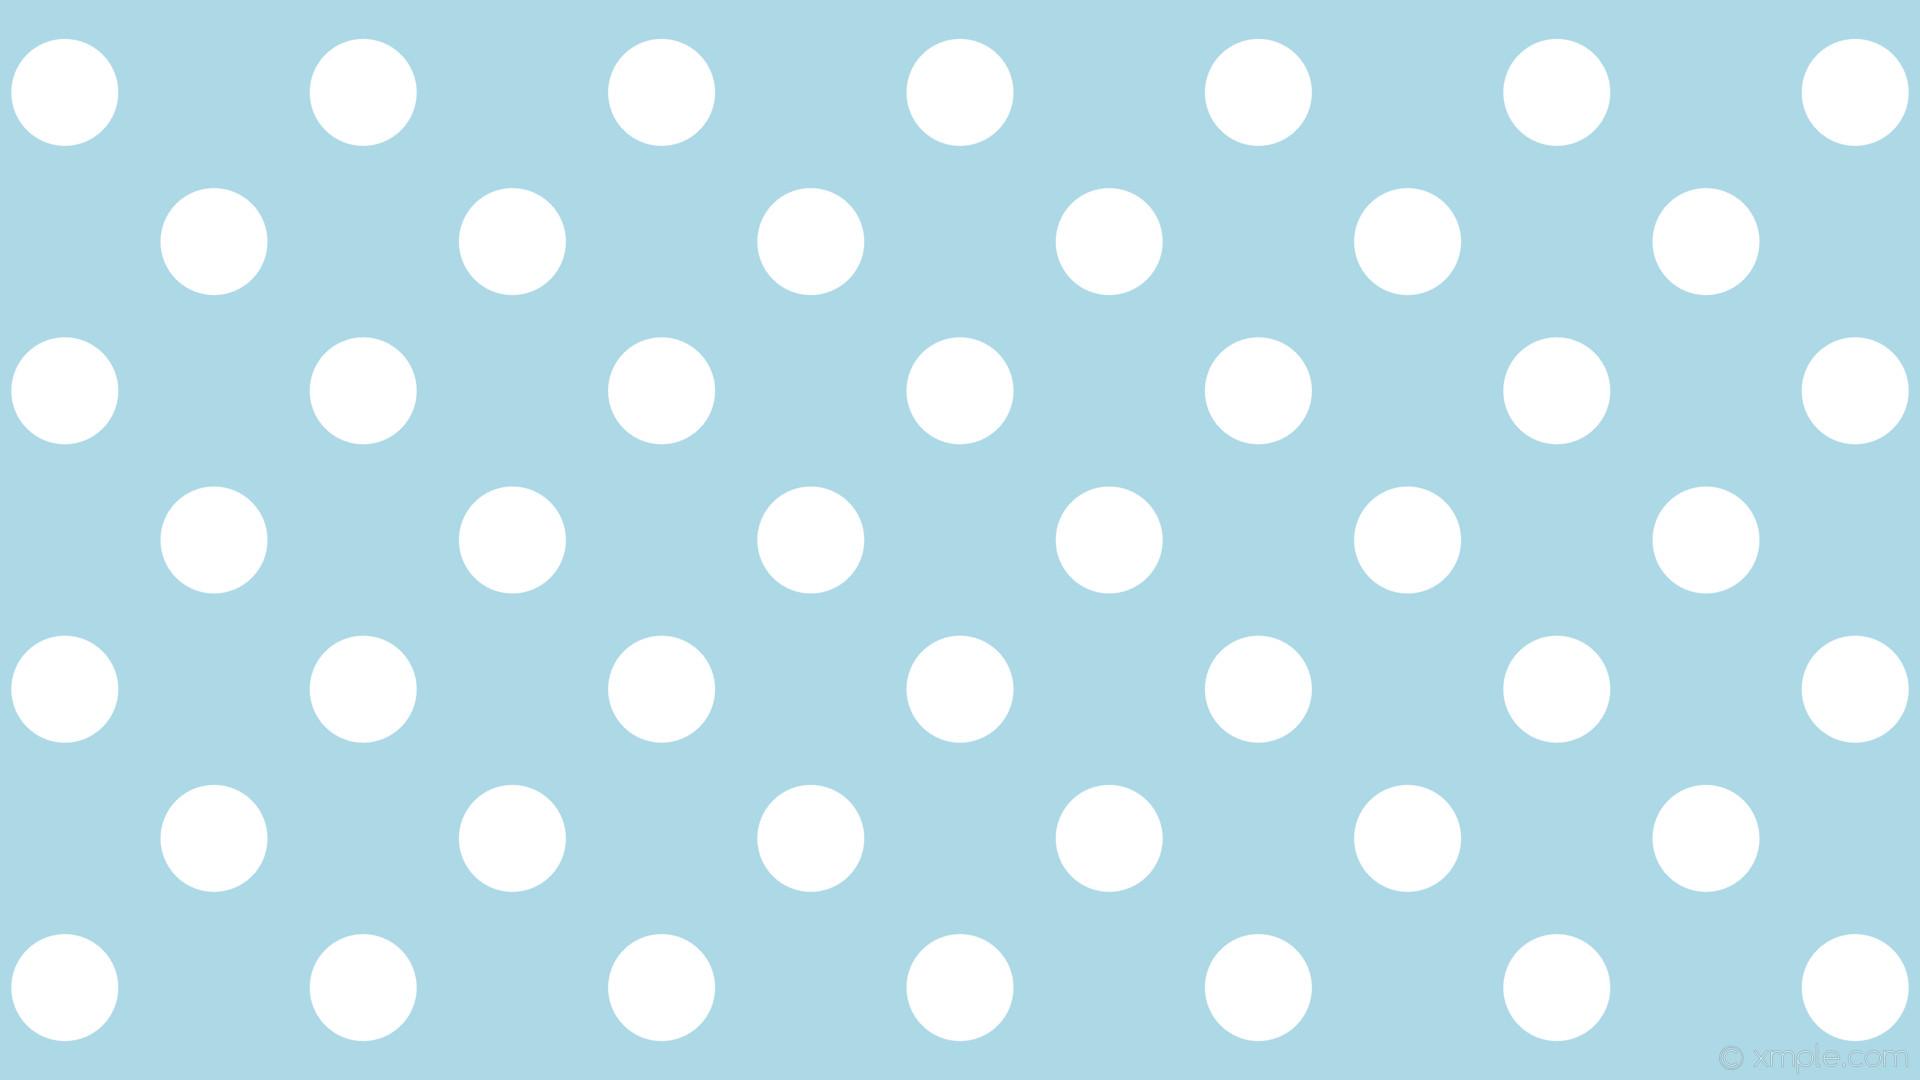 wallpaper white spots blue polka dots light blue #add8e6 #ffffff 45° 107px  211px